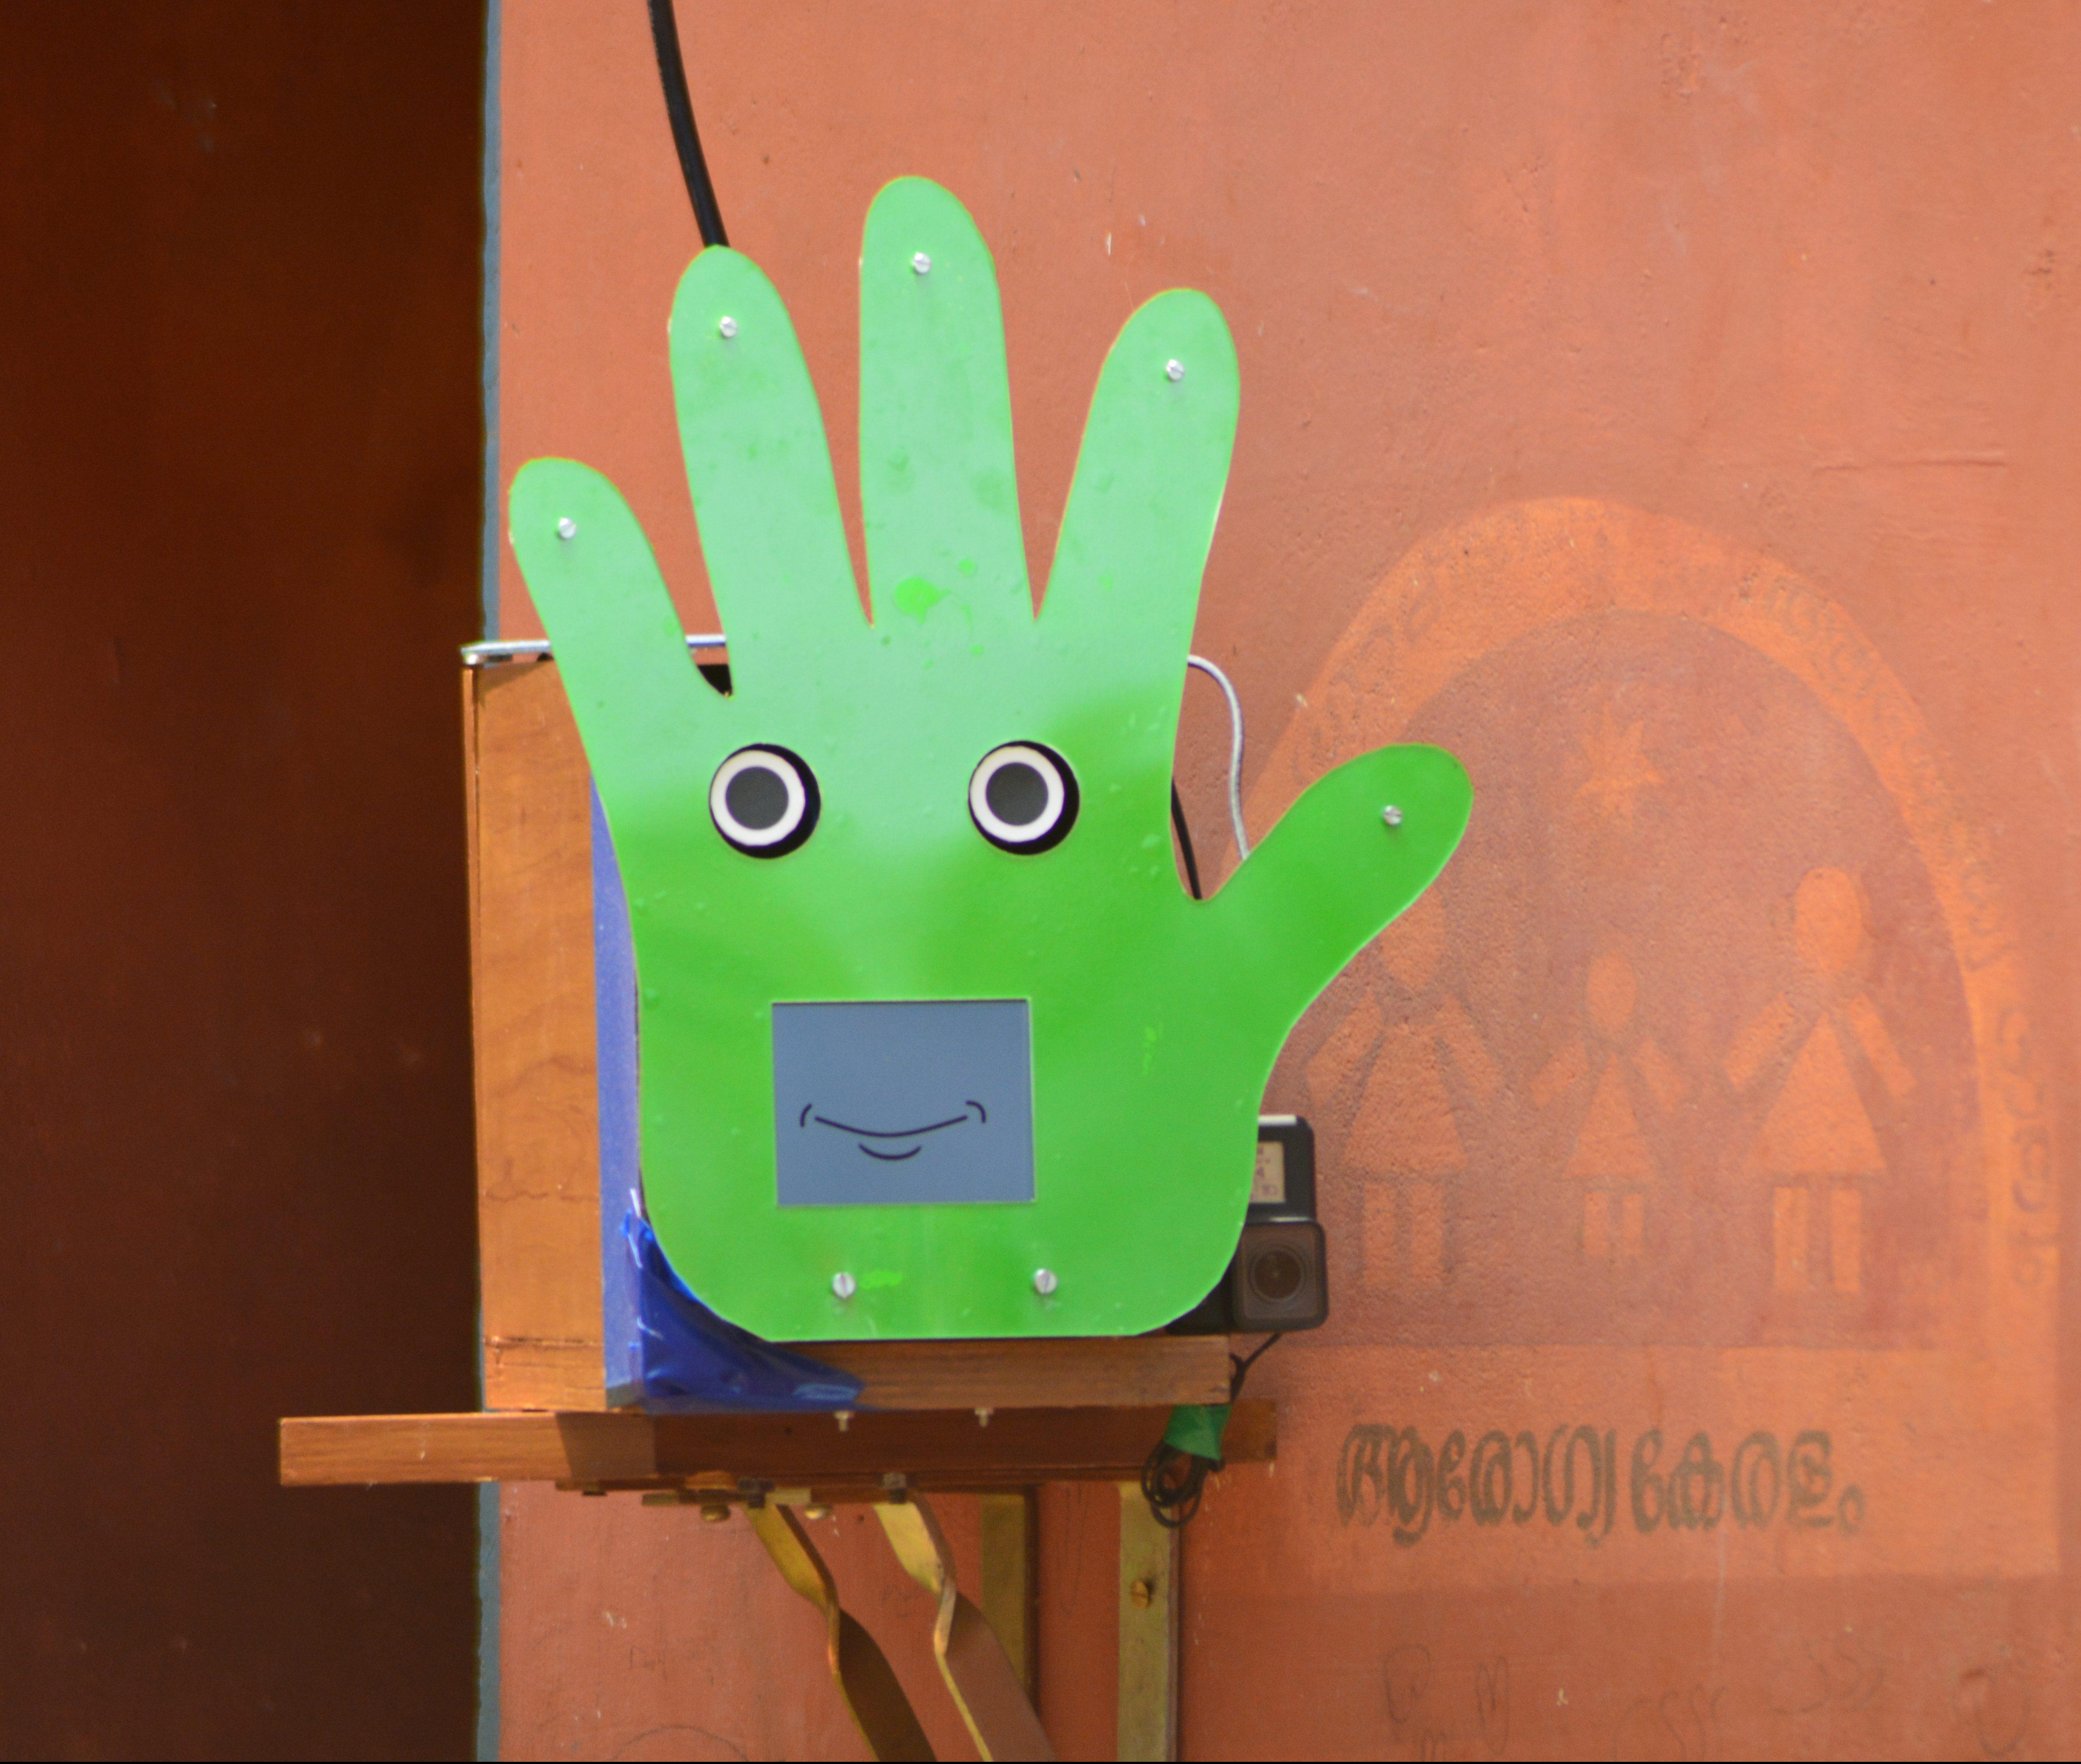 Pepe the robot handwashing monitor